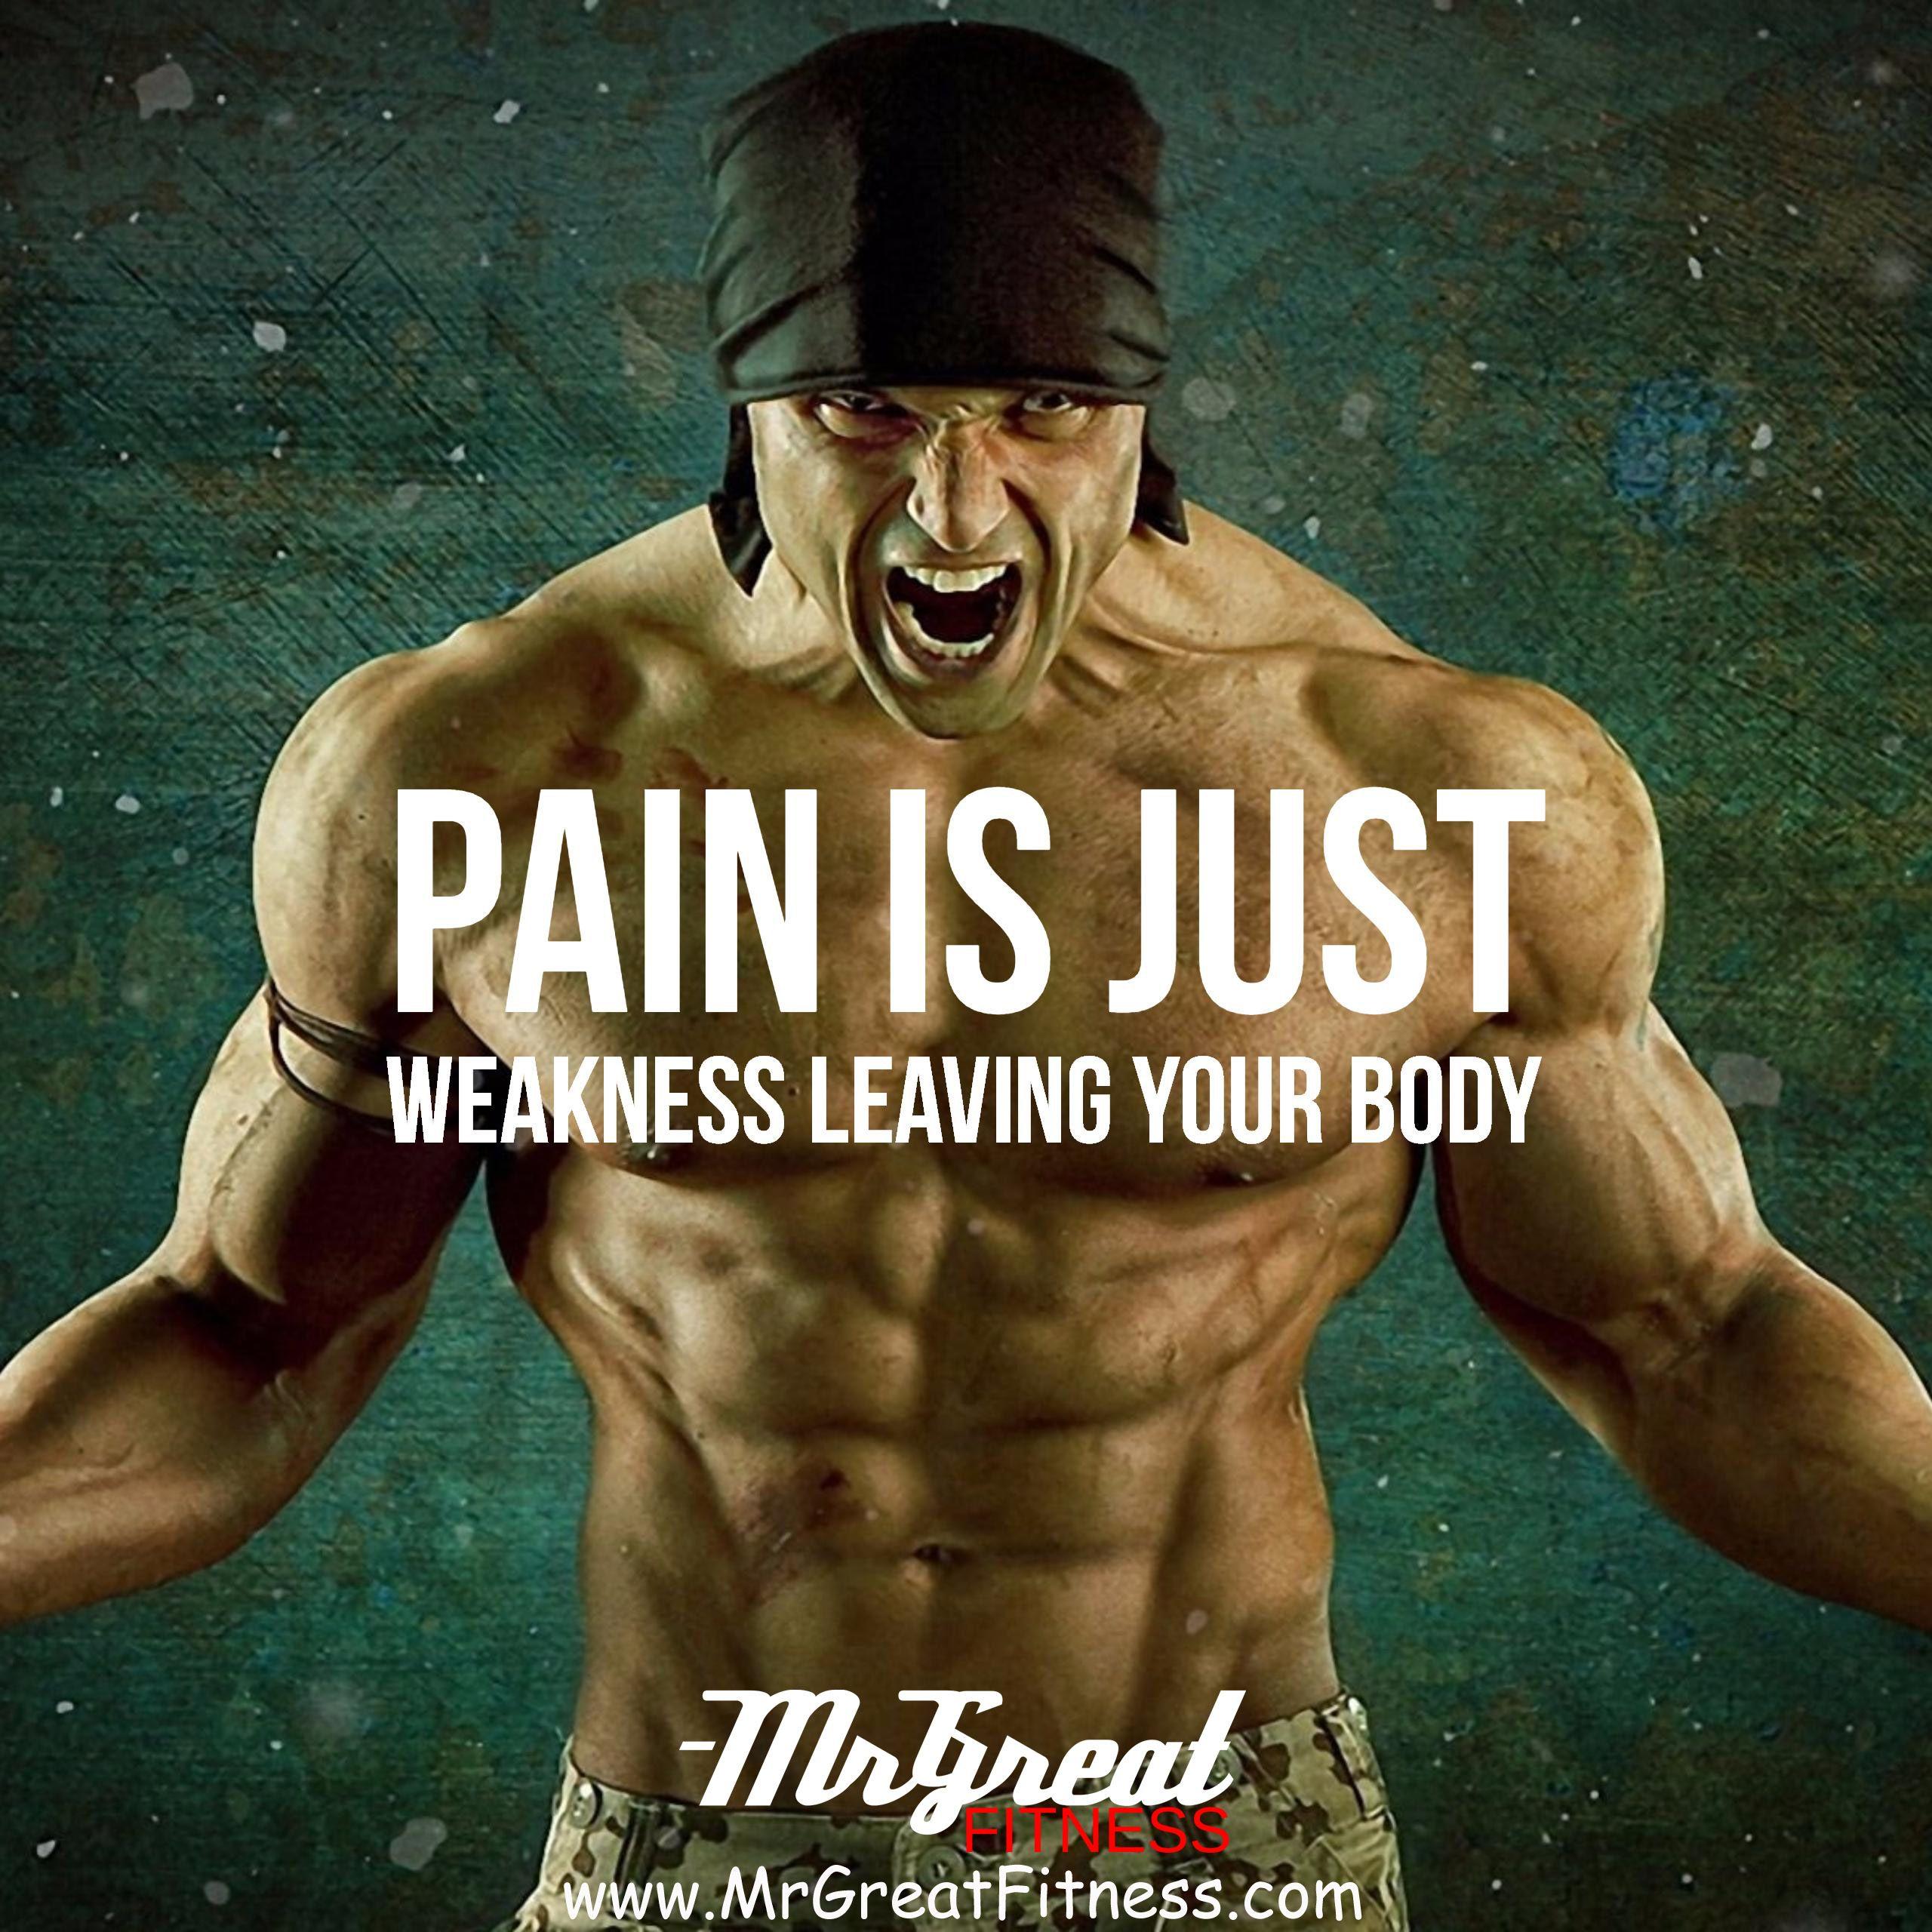 Mr Great Fitness Quotes Fitness Quotes Fitnessquotes Bodybuilding Motivation Quotes Bodybuilding Motivation Gym Workout Tips